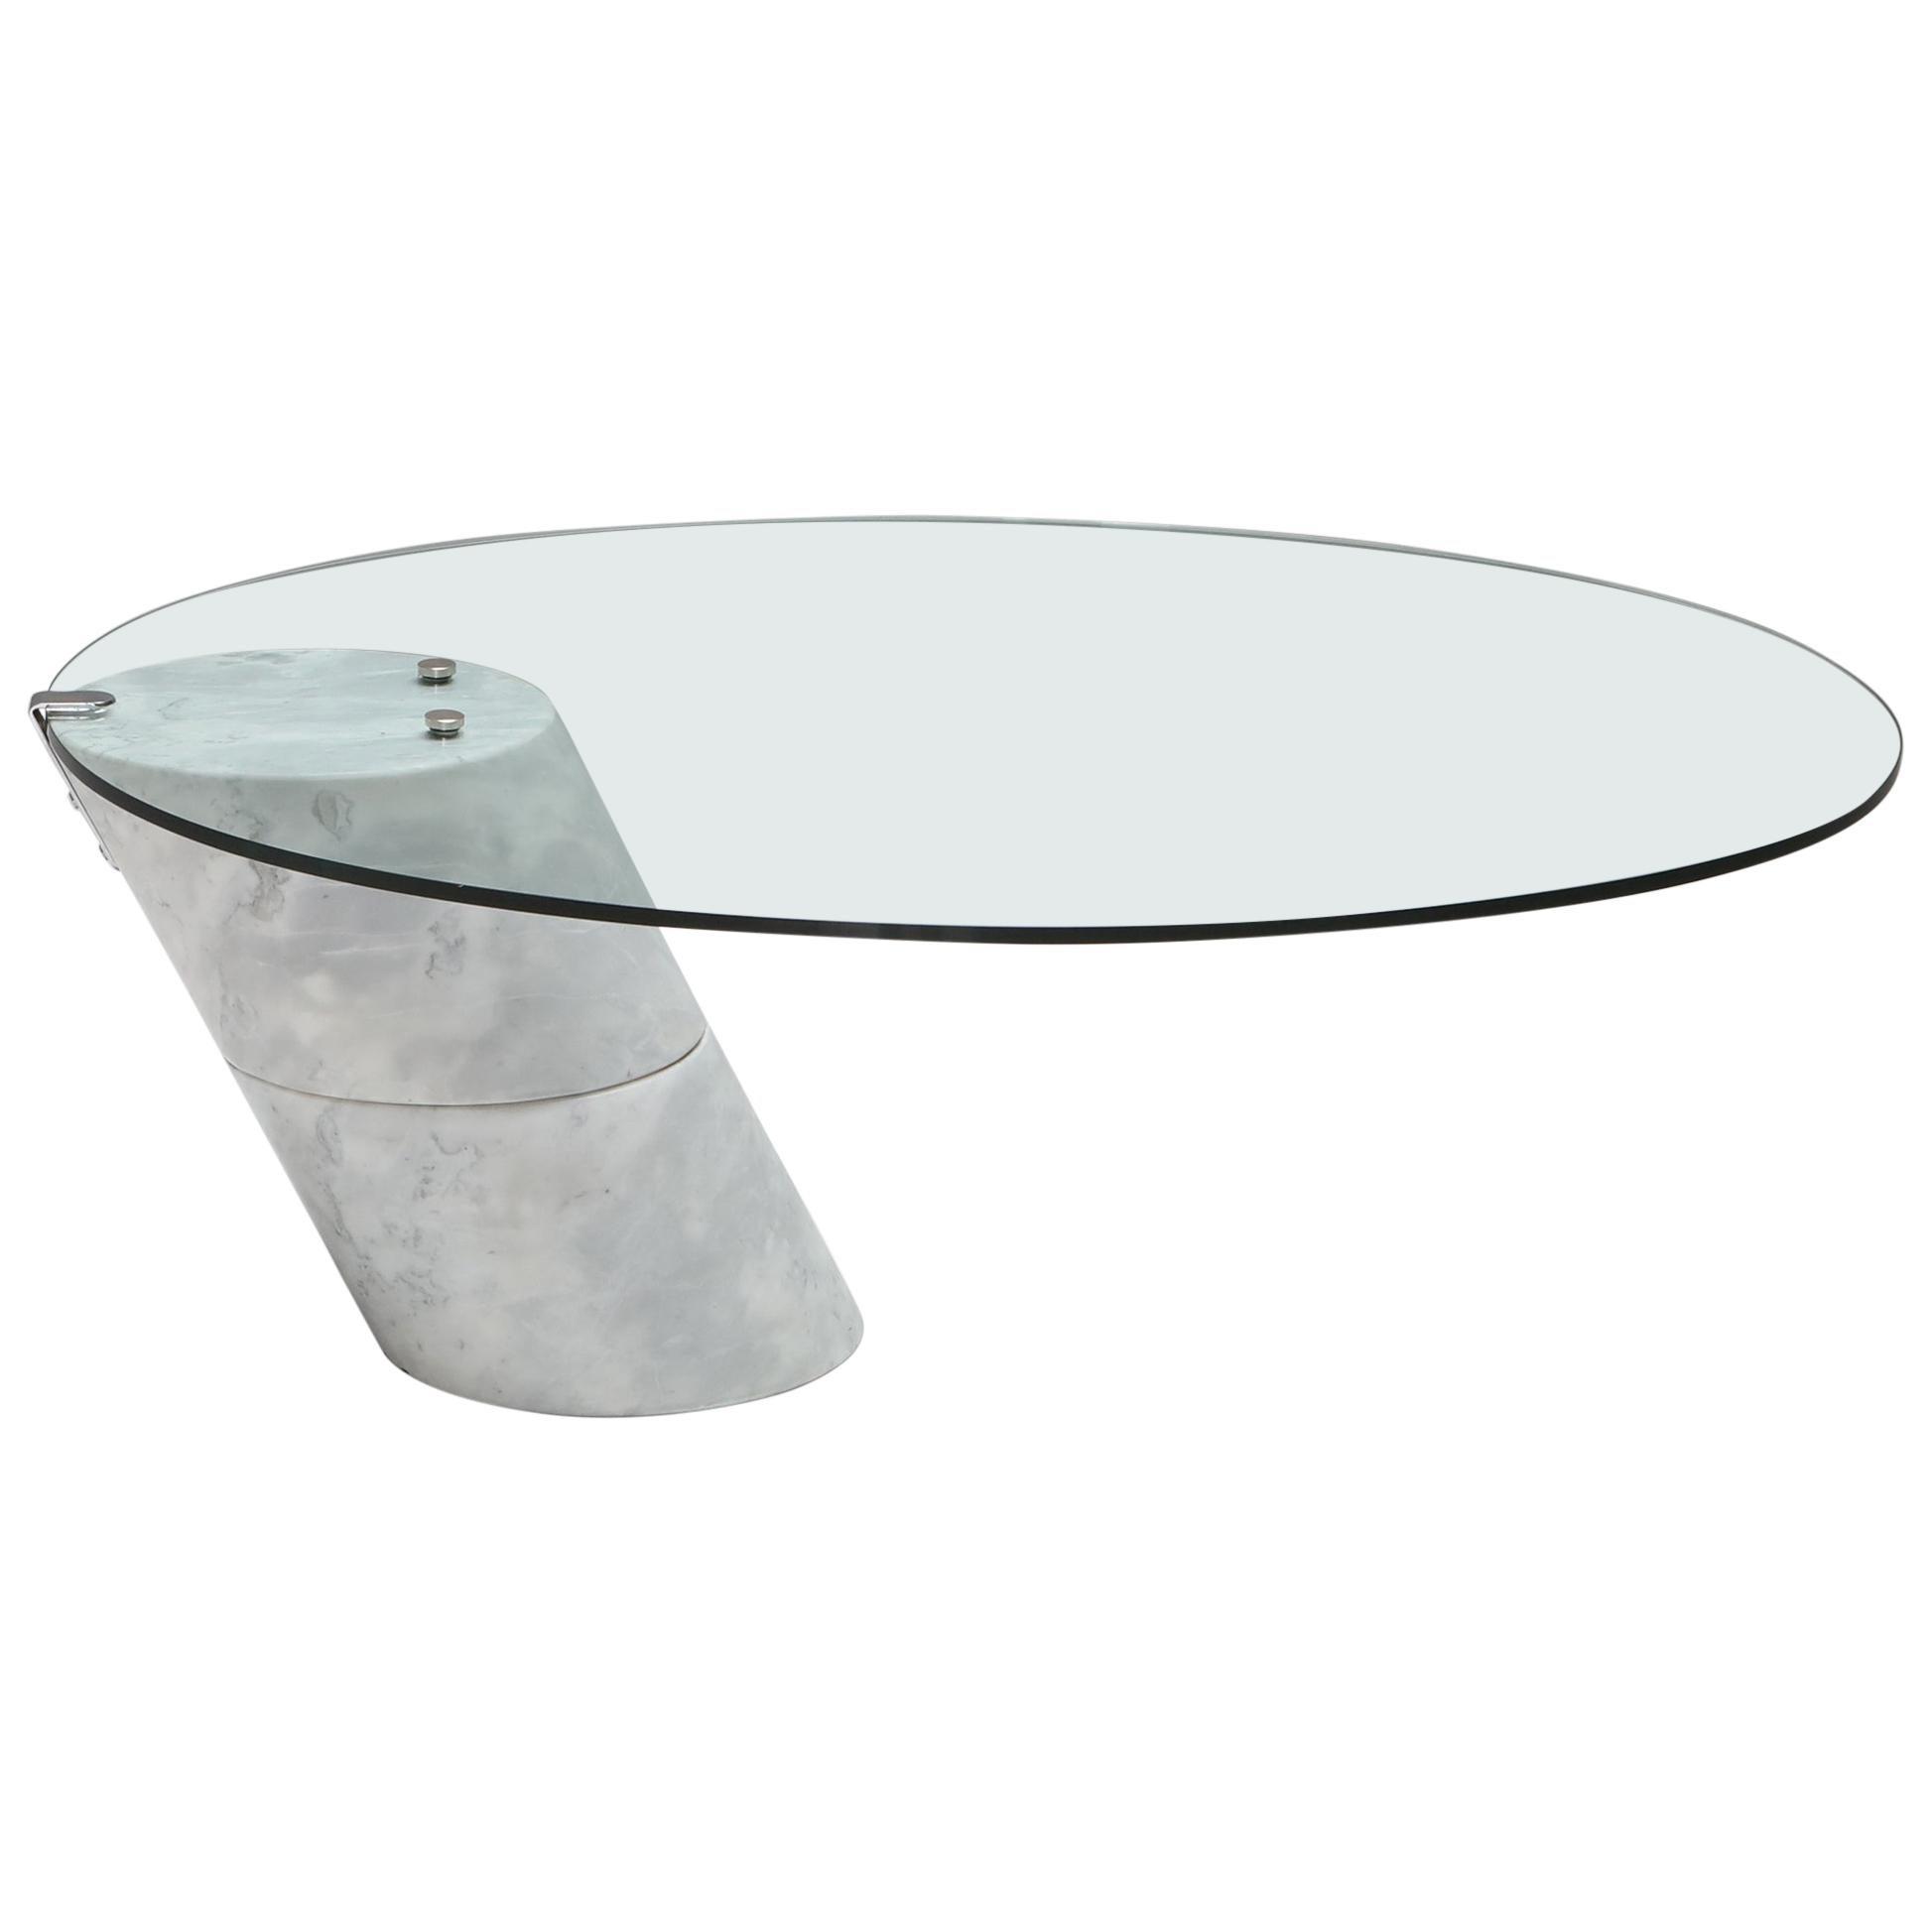 Postmodern Marble Coffee Table by Ronald Schmitt